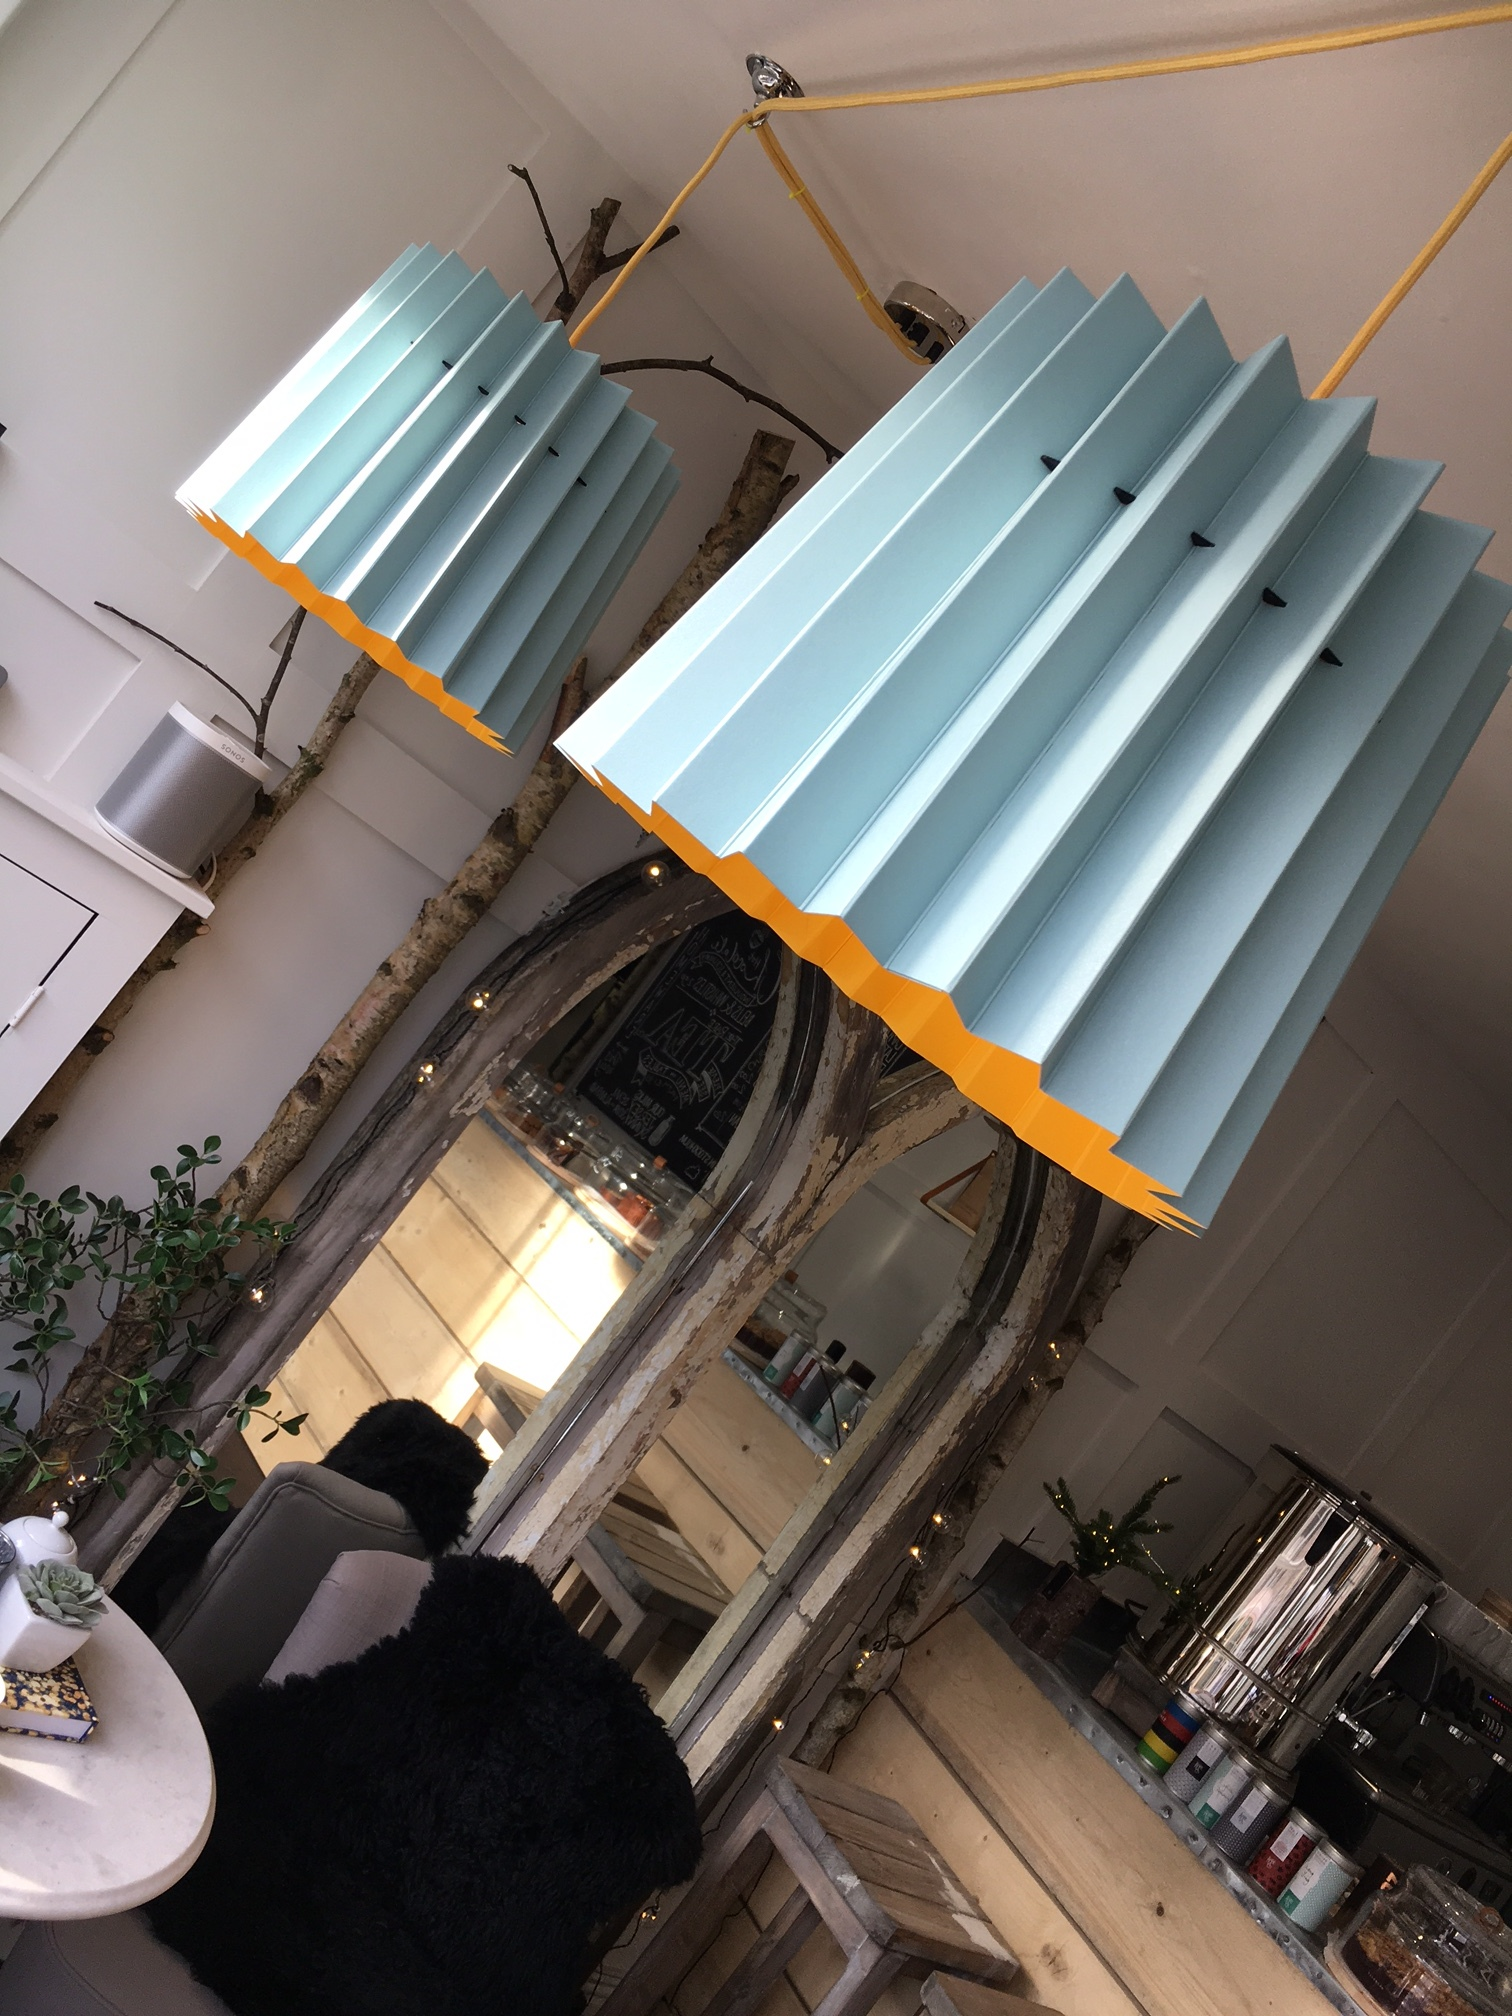 Lane Twin Tone Lampshades in Fika cafe, Oakham